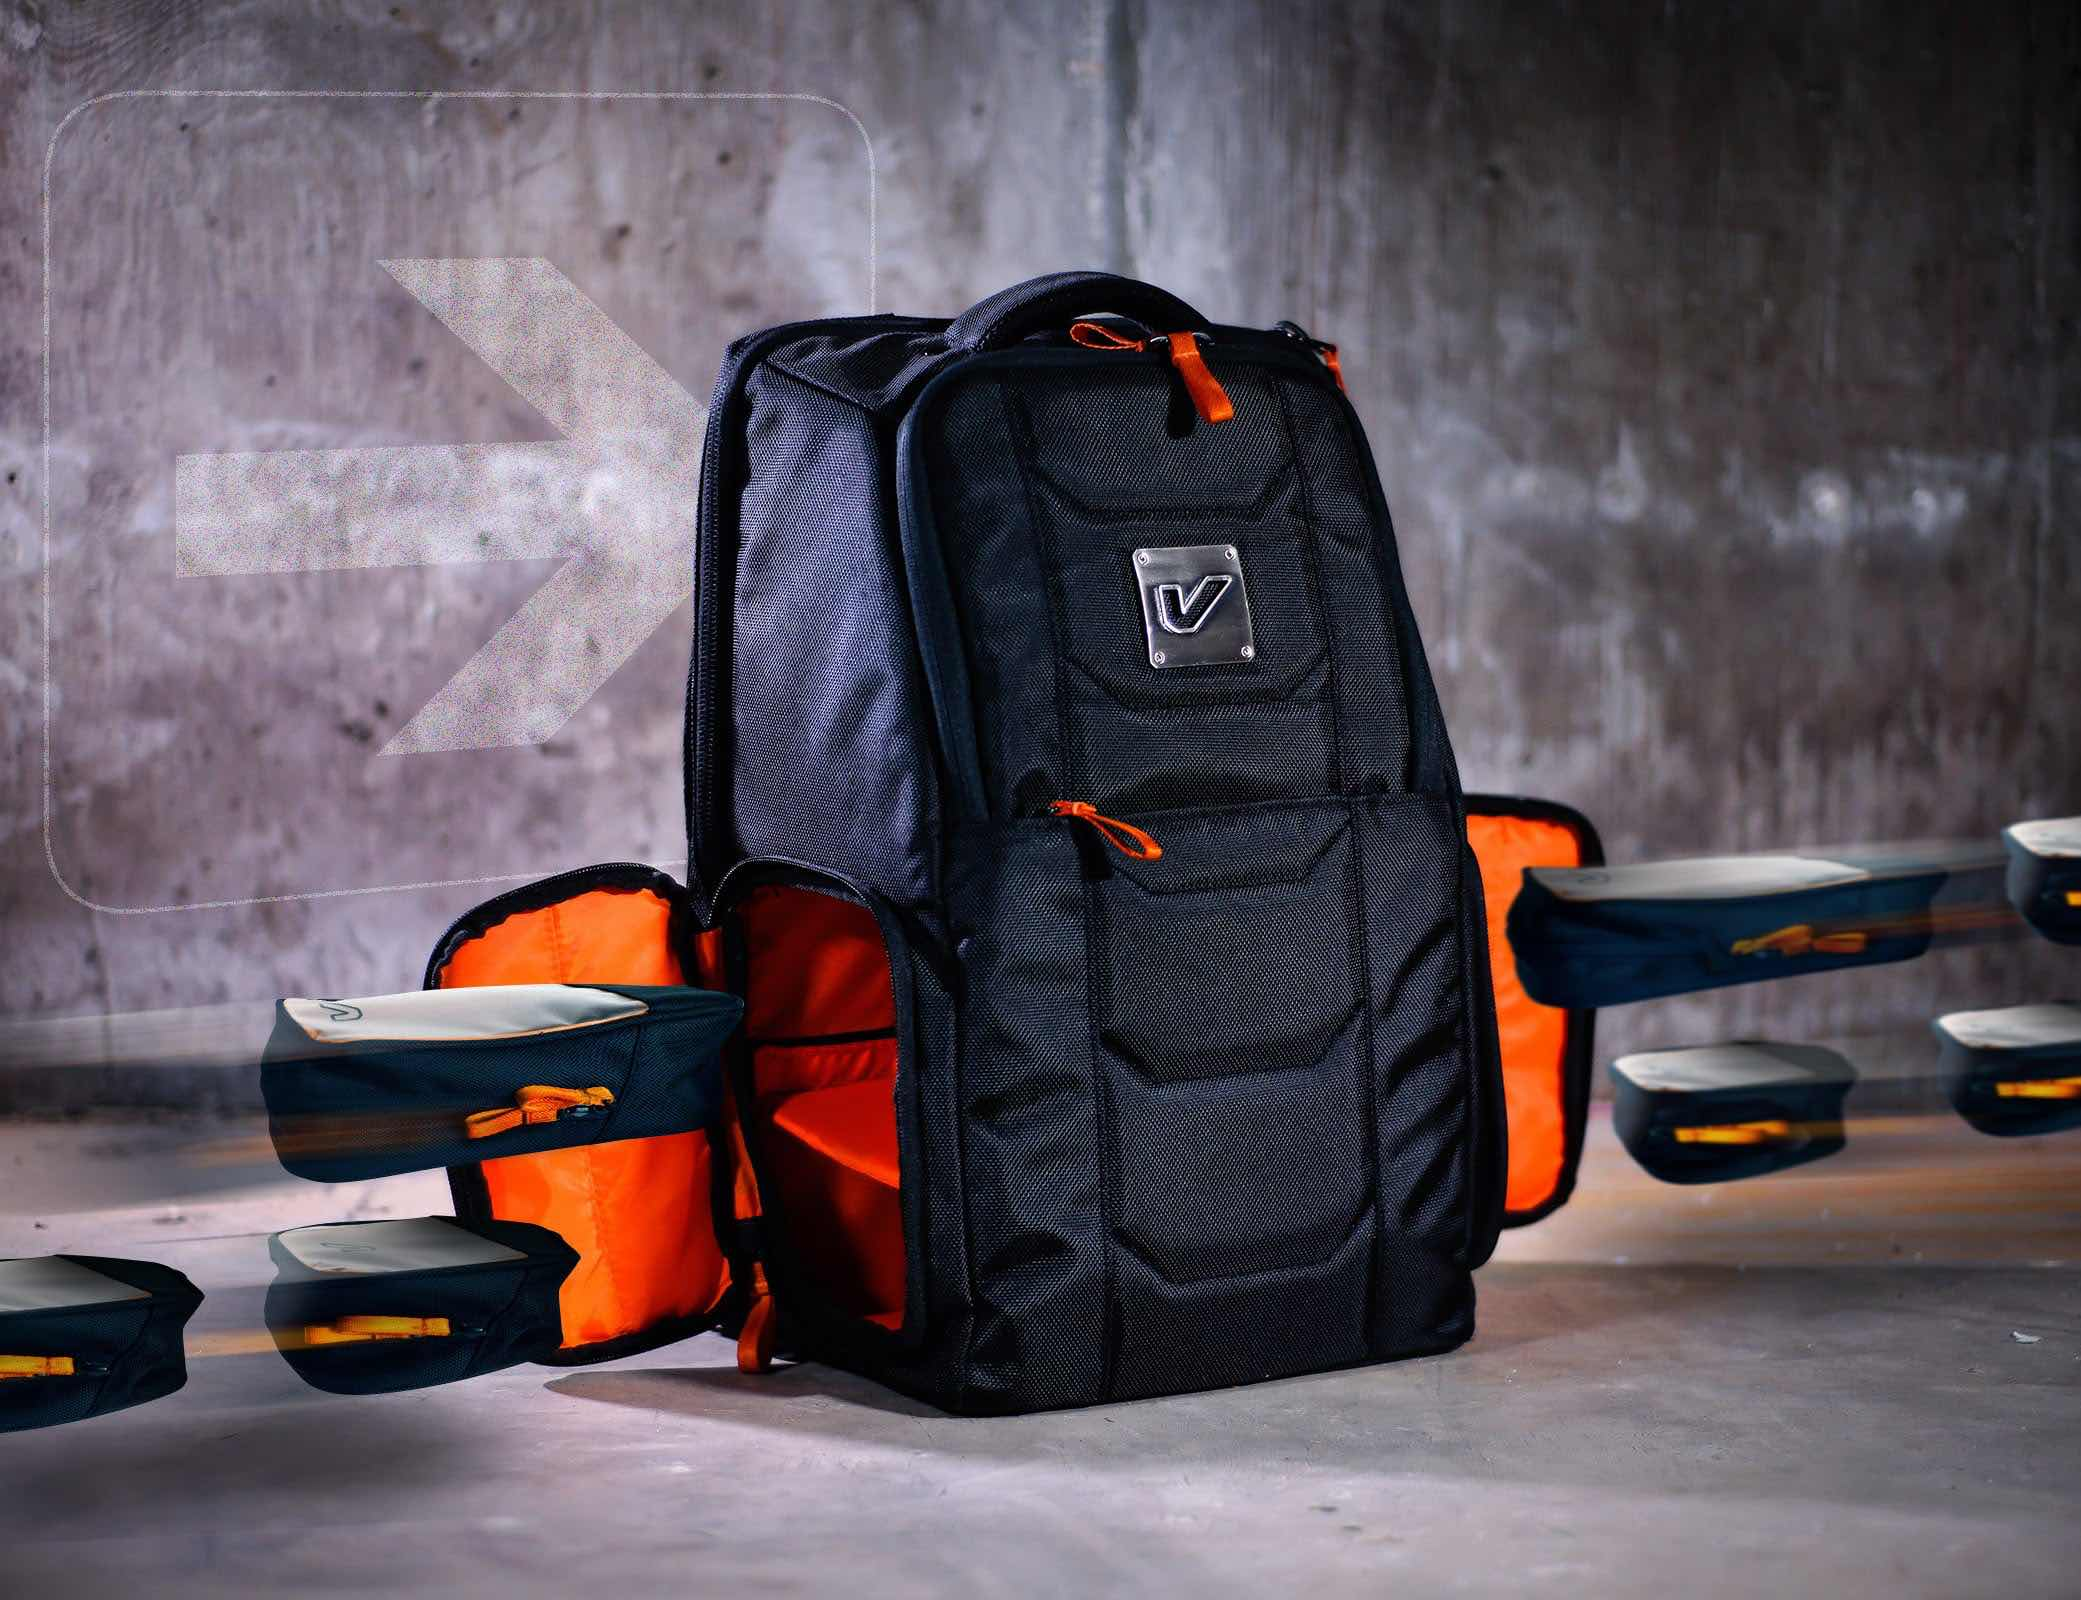 Gruv Gear Elite Traveler Backpack